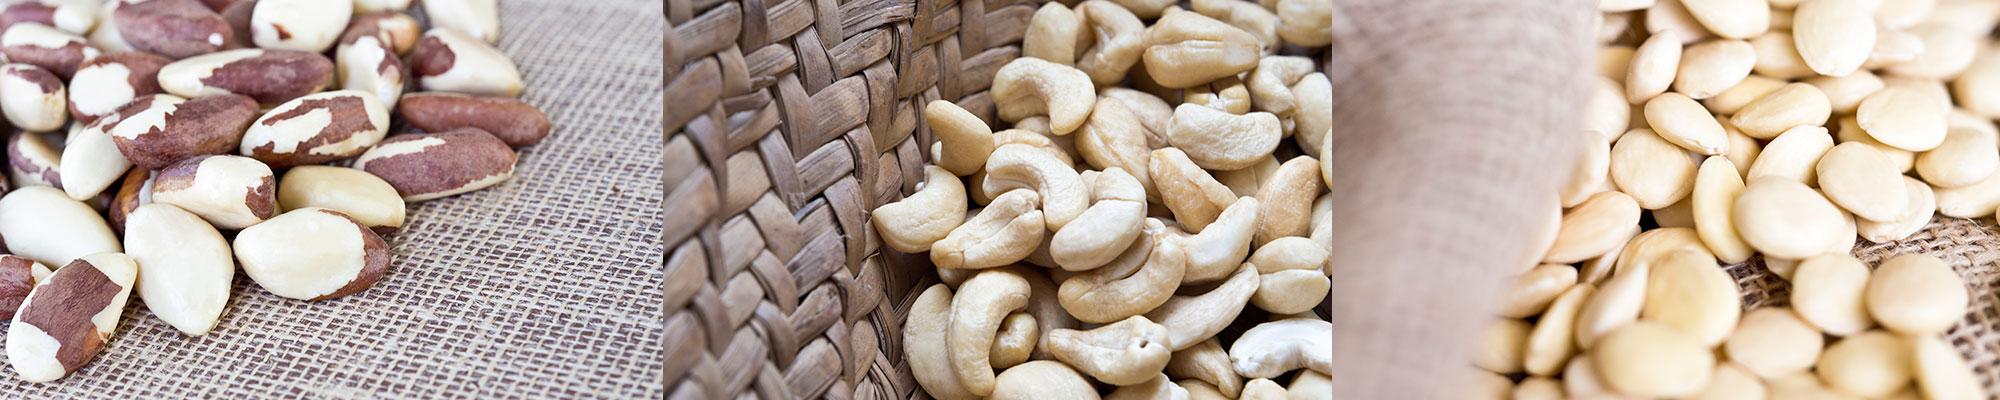 caro-nut-big